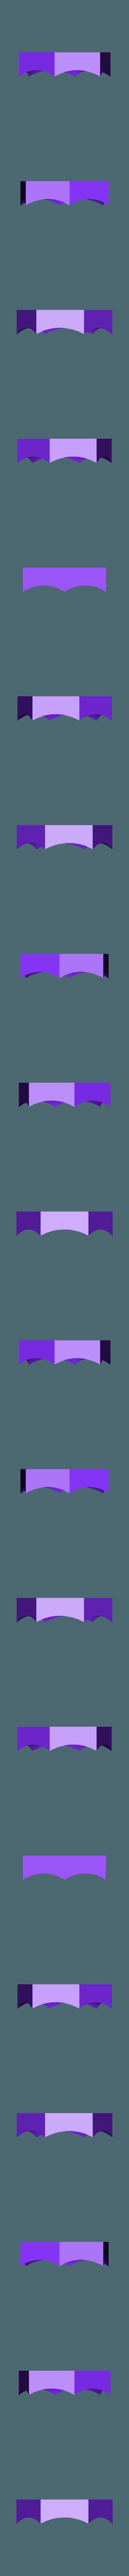 Prusa Reception_Dominik Cisar_Hexagon Tile 1.stl Download free STL file Prusa Reception Tiles - PrusaLab • 3D print model, cisardom